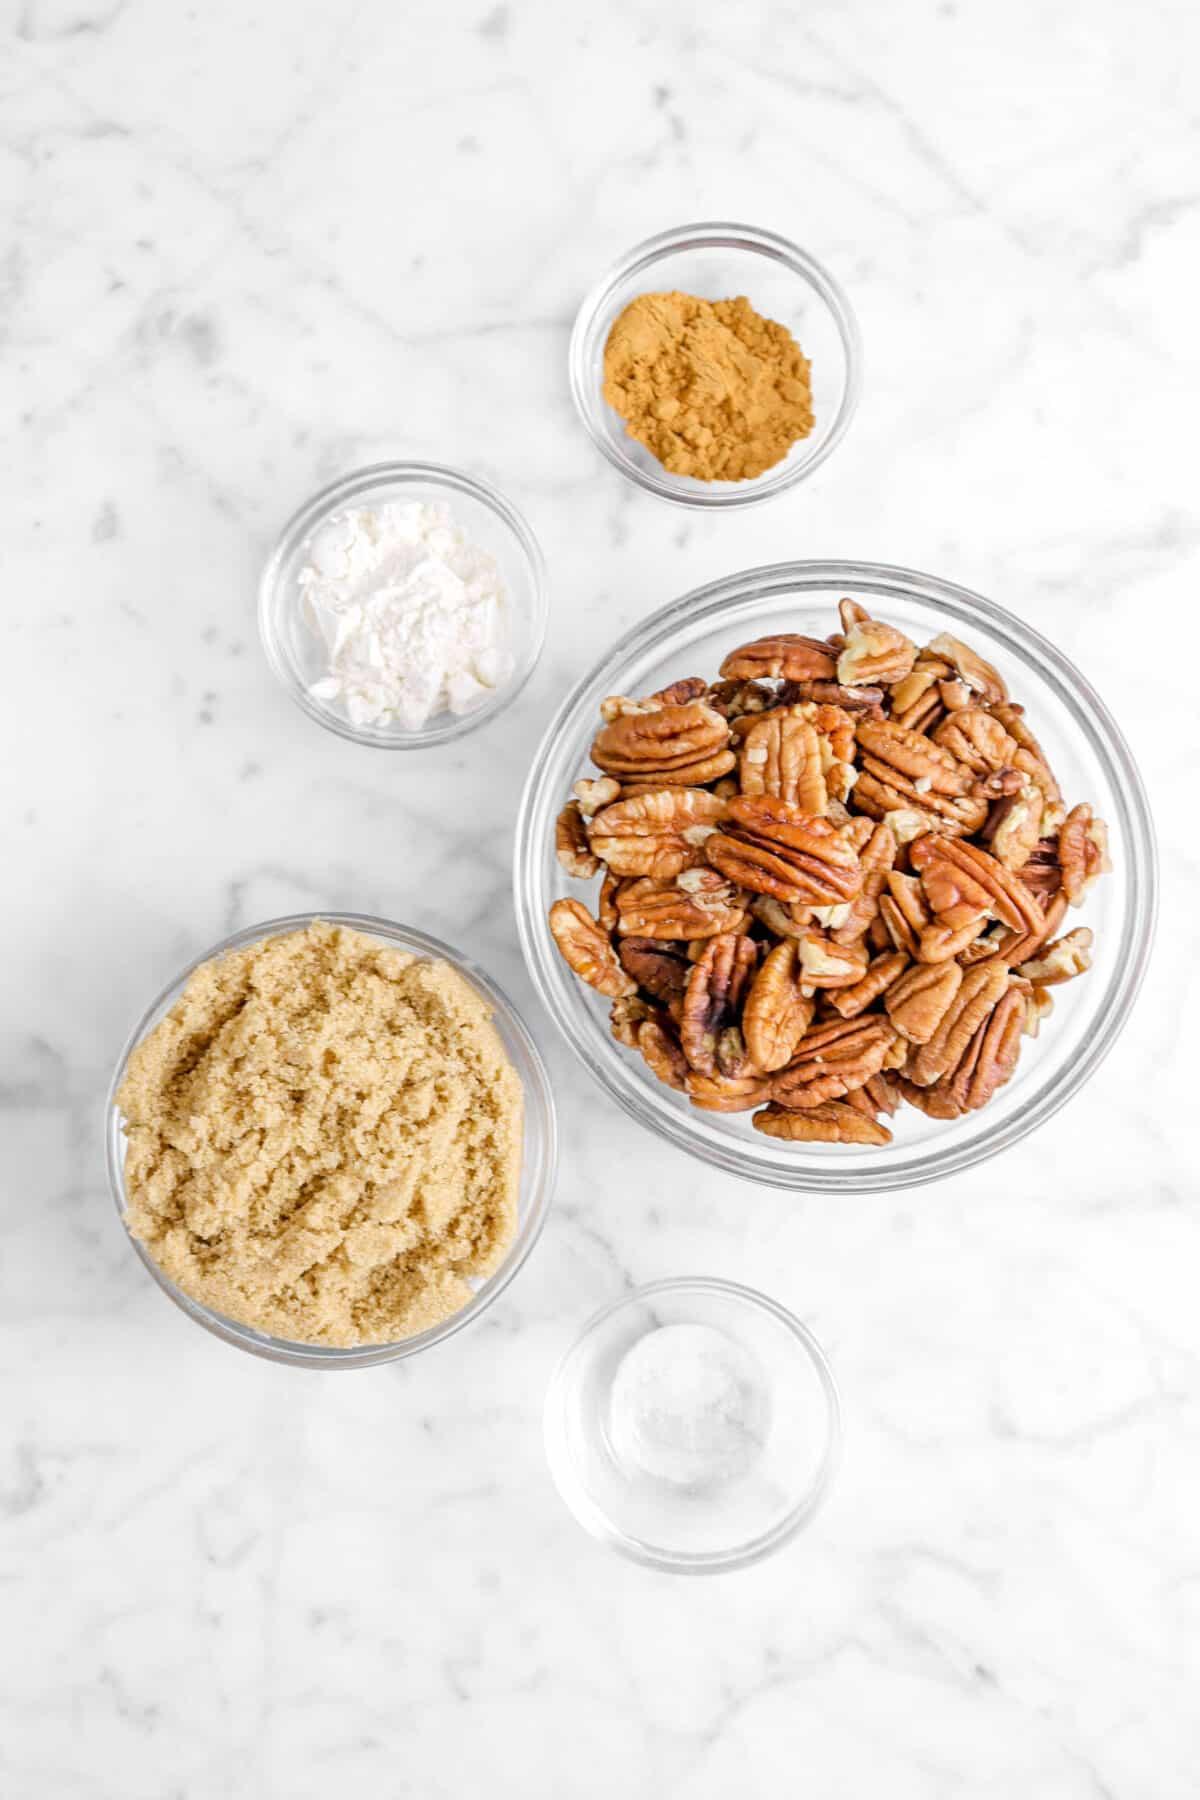 cinnamon, flour, brown sugar, pecans, and salt in glass bowls